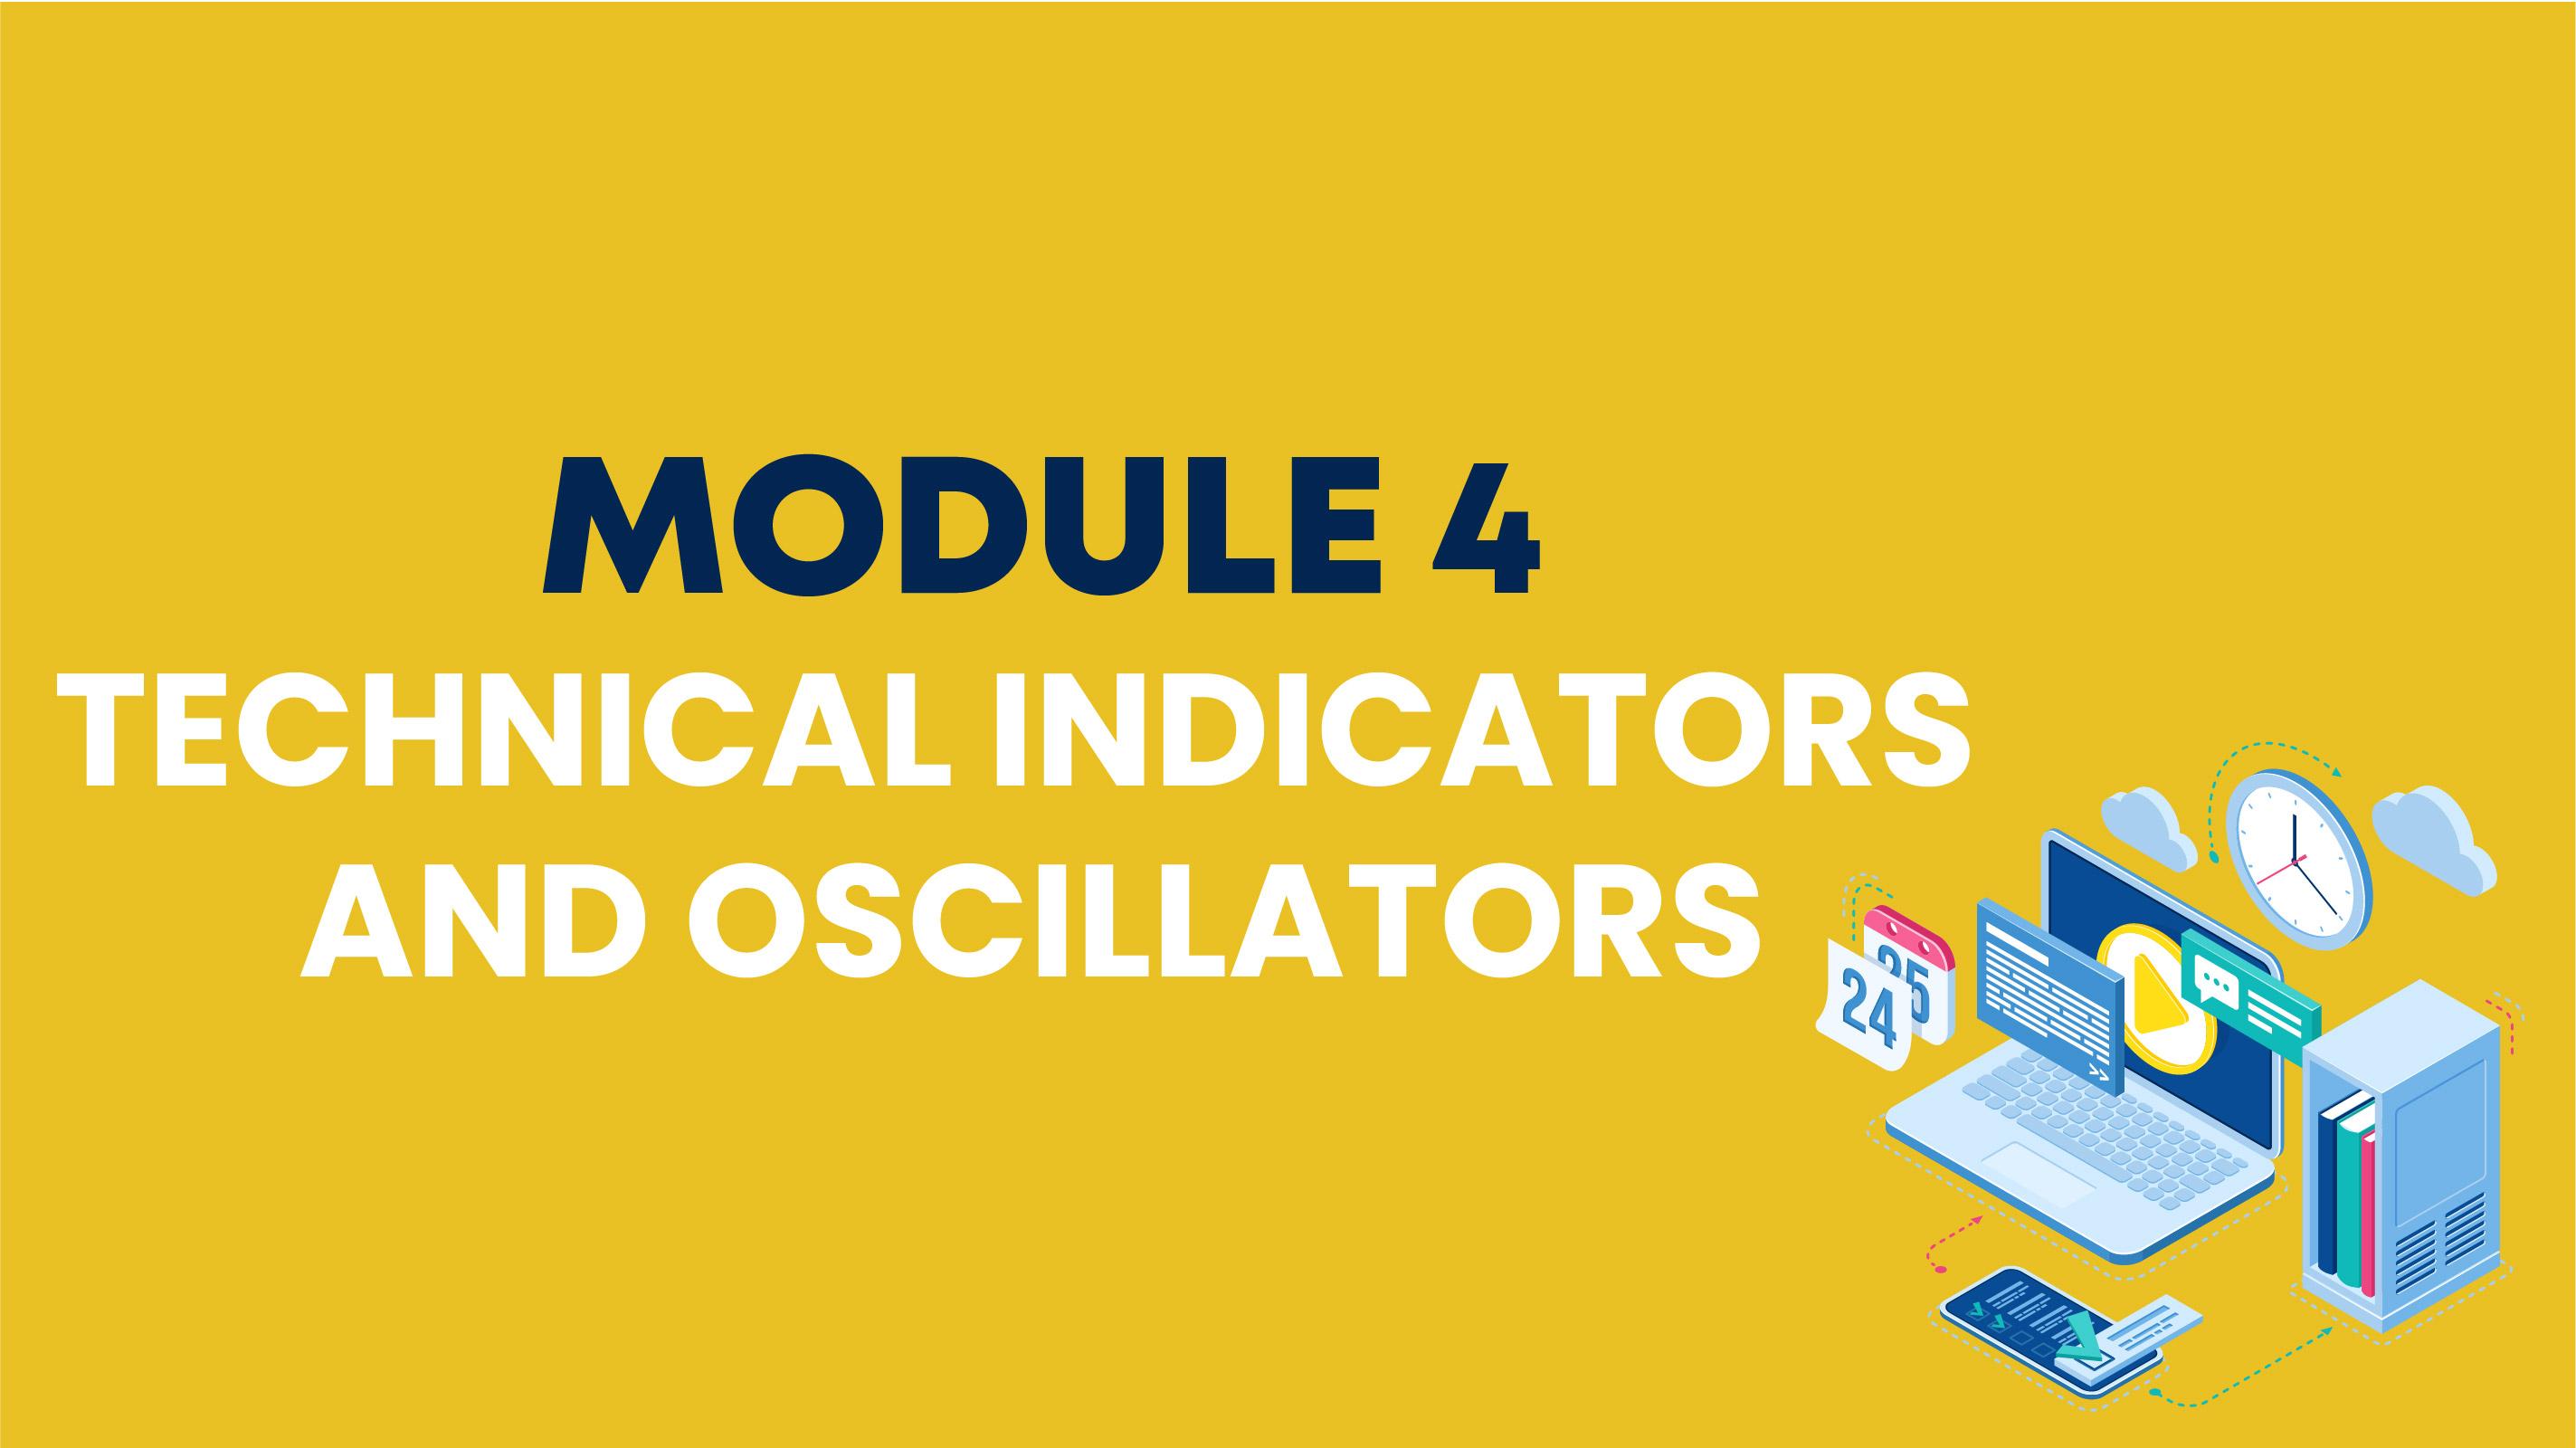 MODULE 4: TECHNICAL INDICATORS AND OSCILLATORS